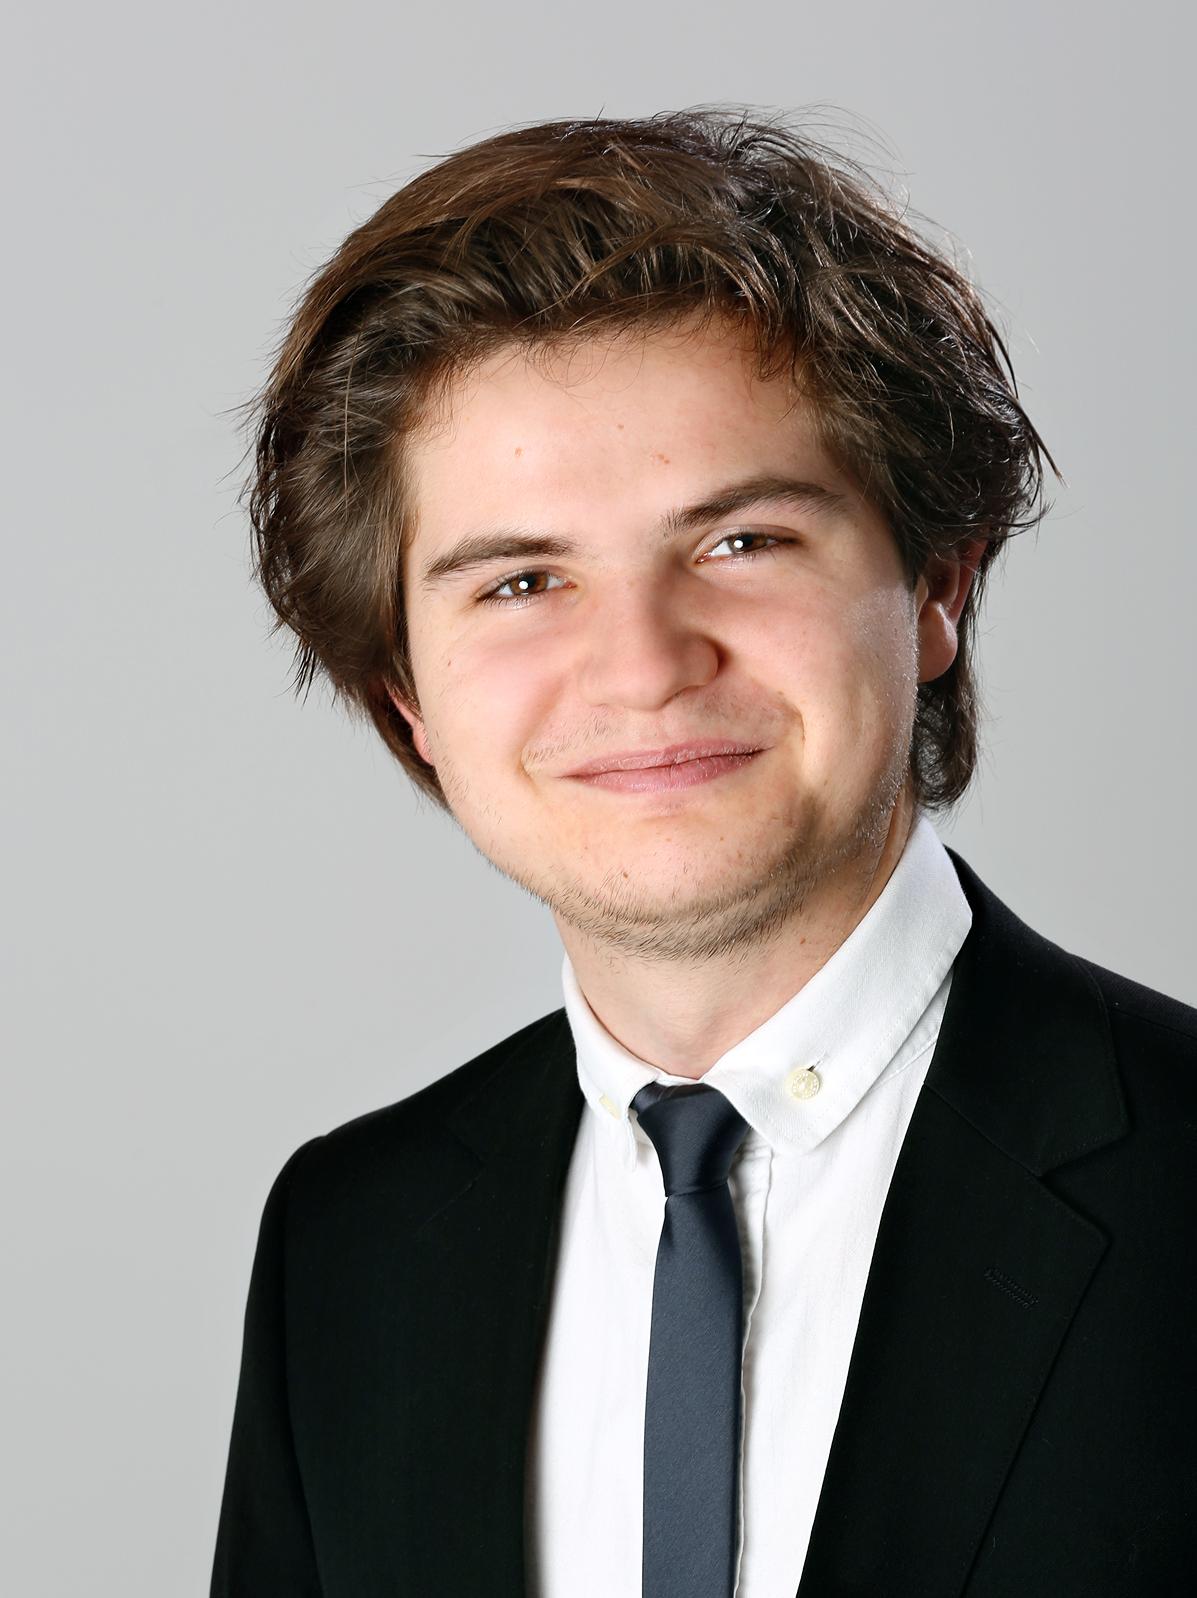 Dominik Werner